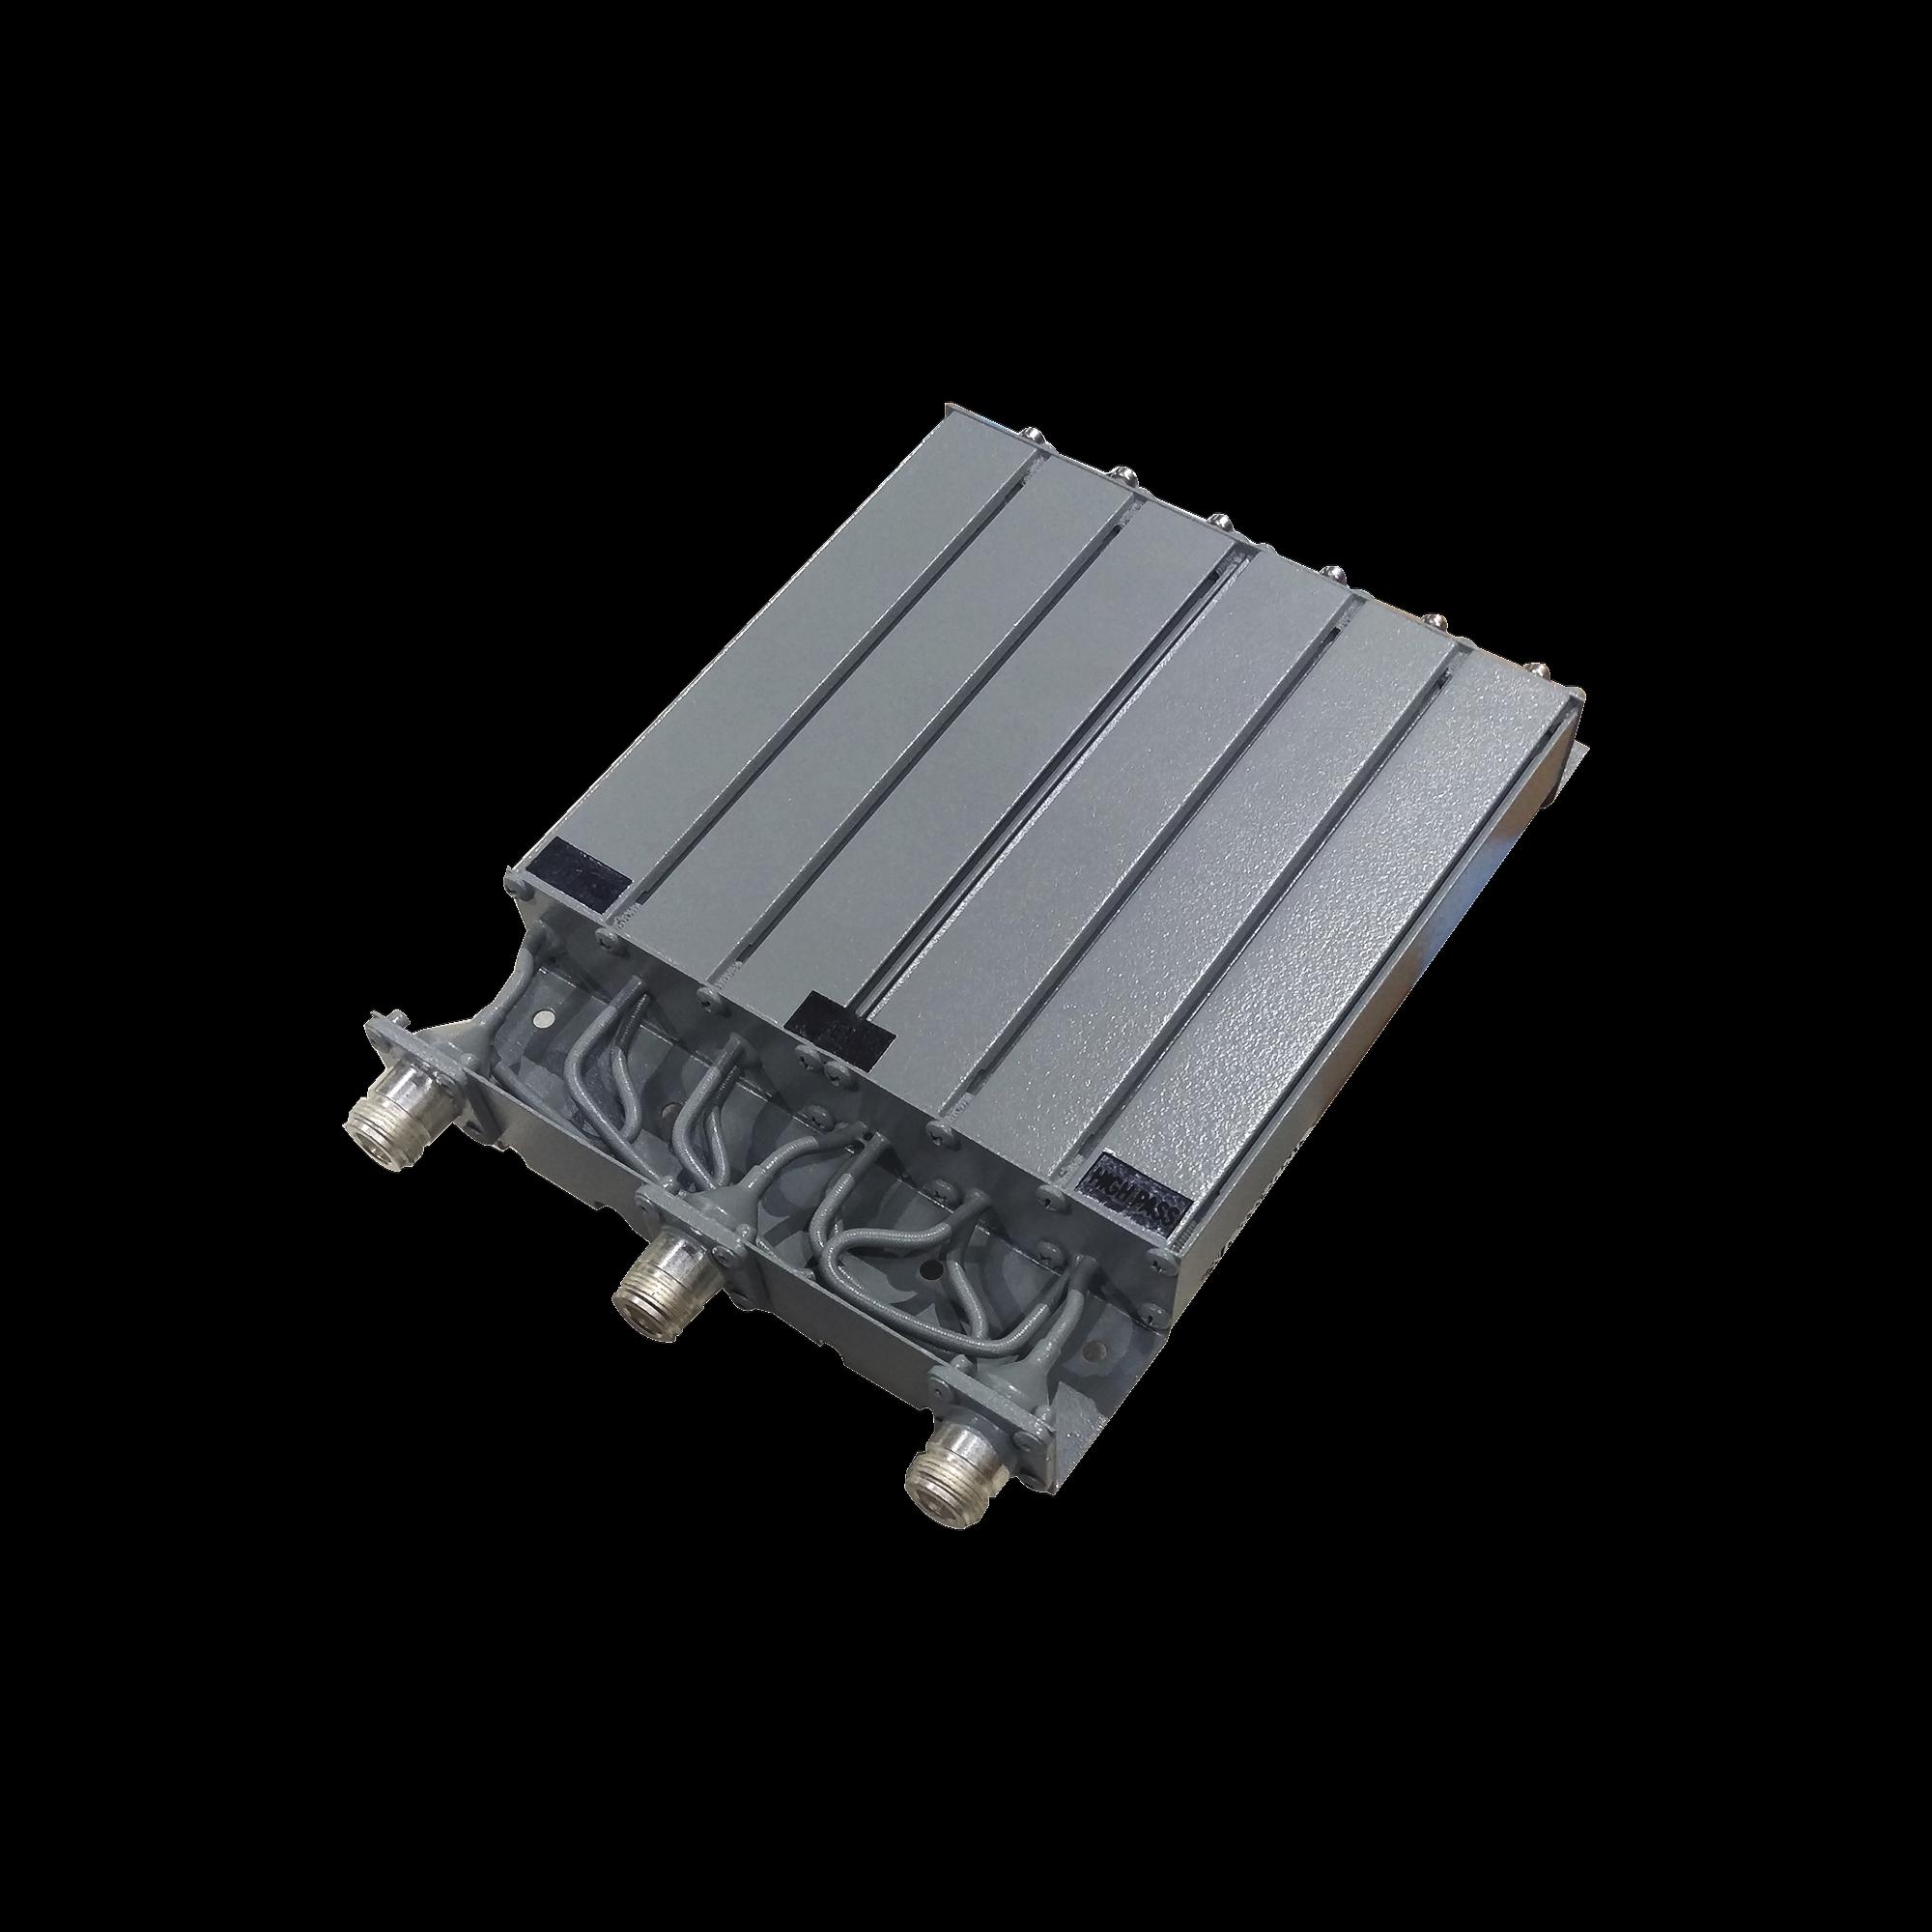 Duplexer UHF, 470-490 MHz, 6 Cavidades, Conector N Hembra.